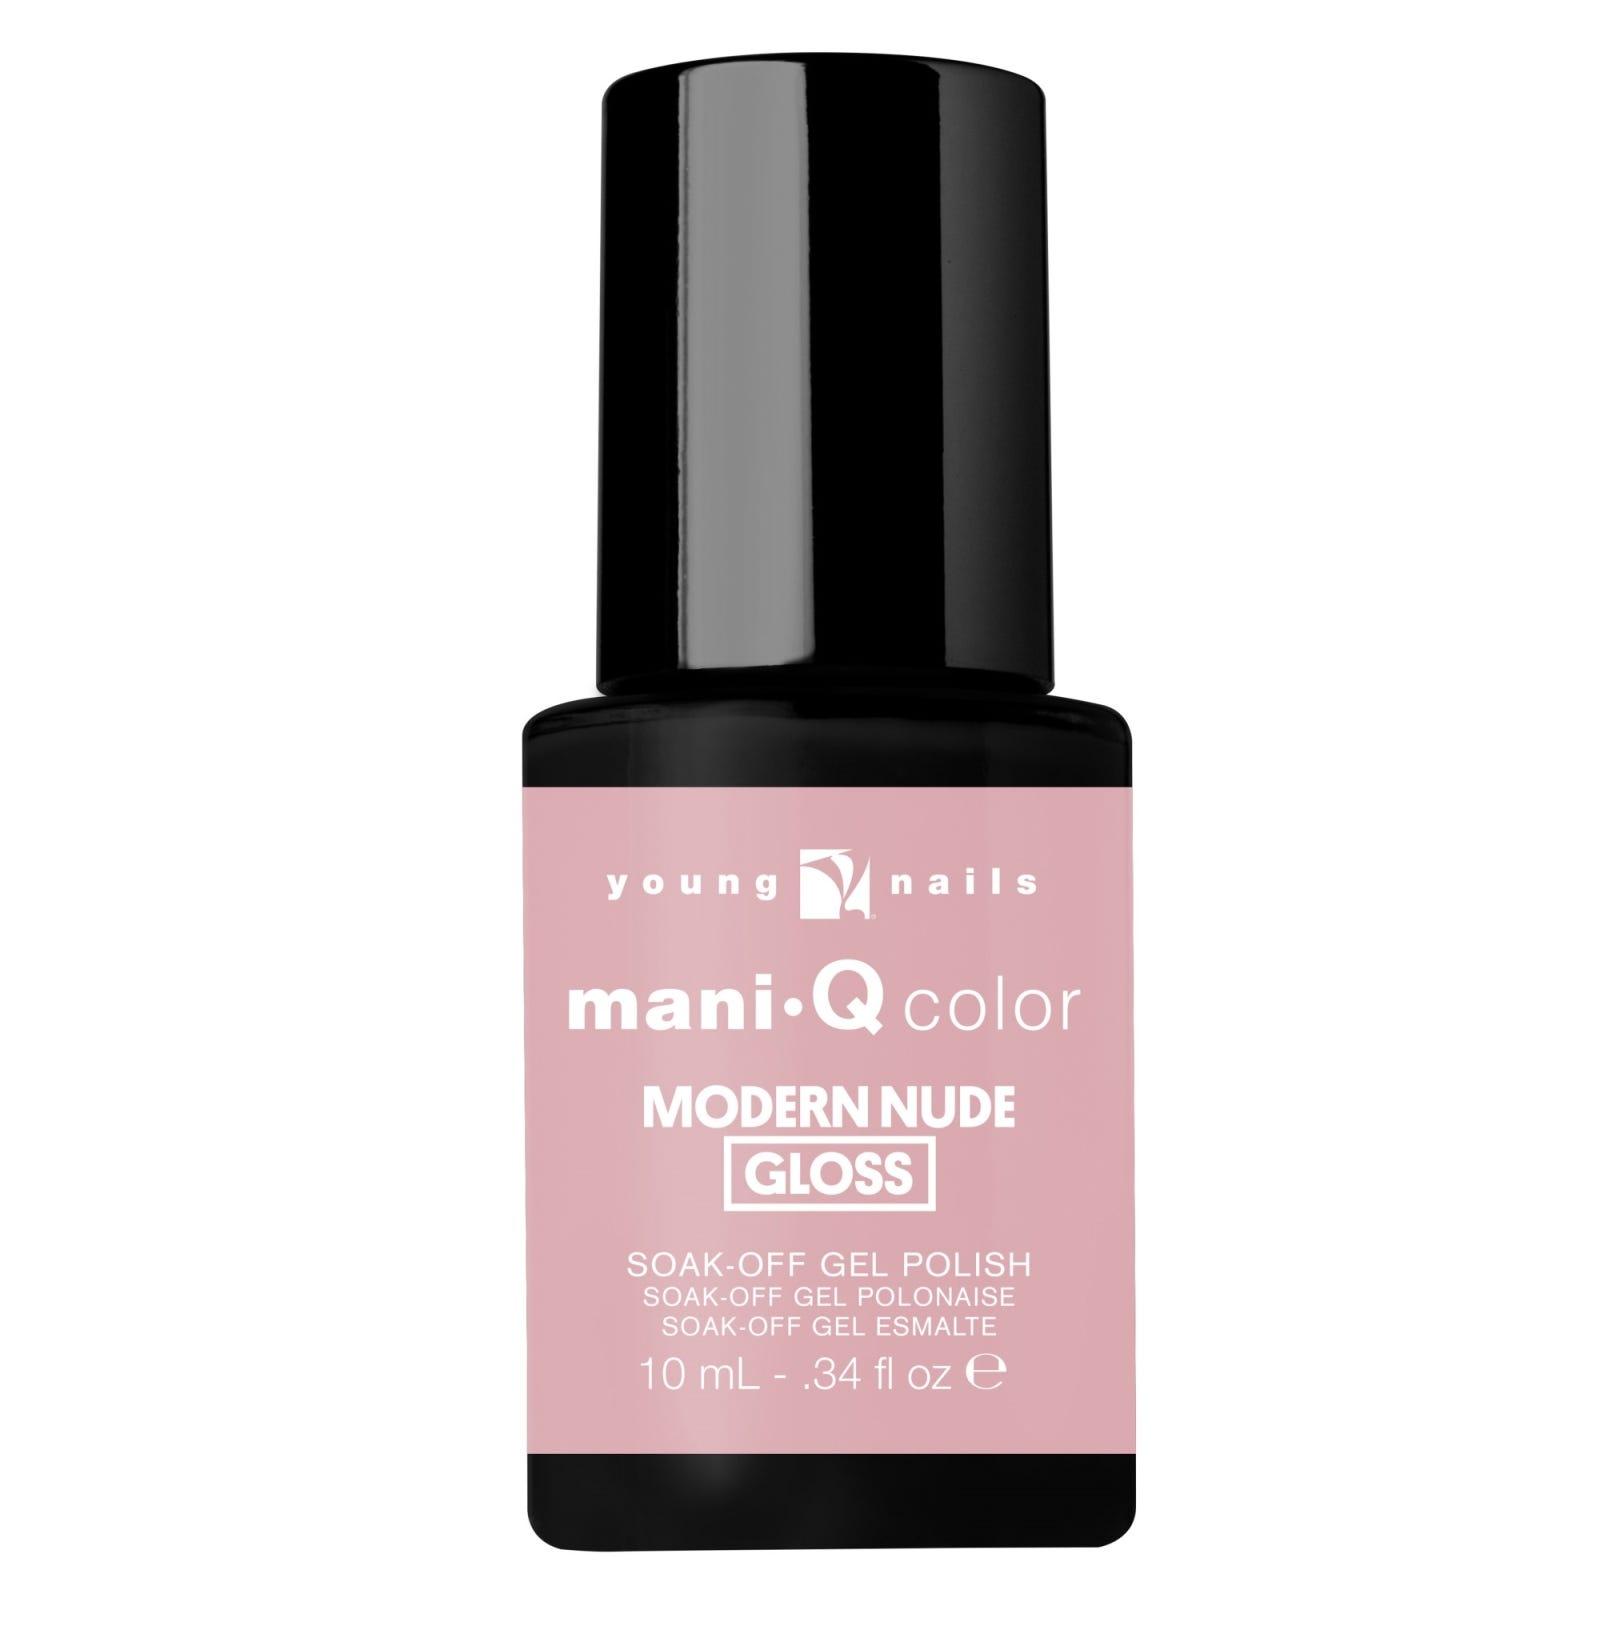 Nude Nail Polishes That Work On Dark Skin